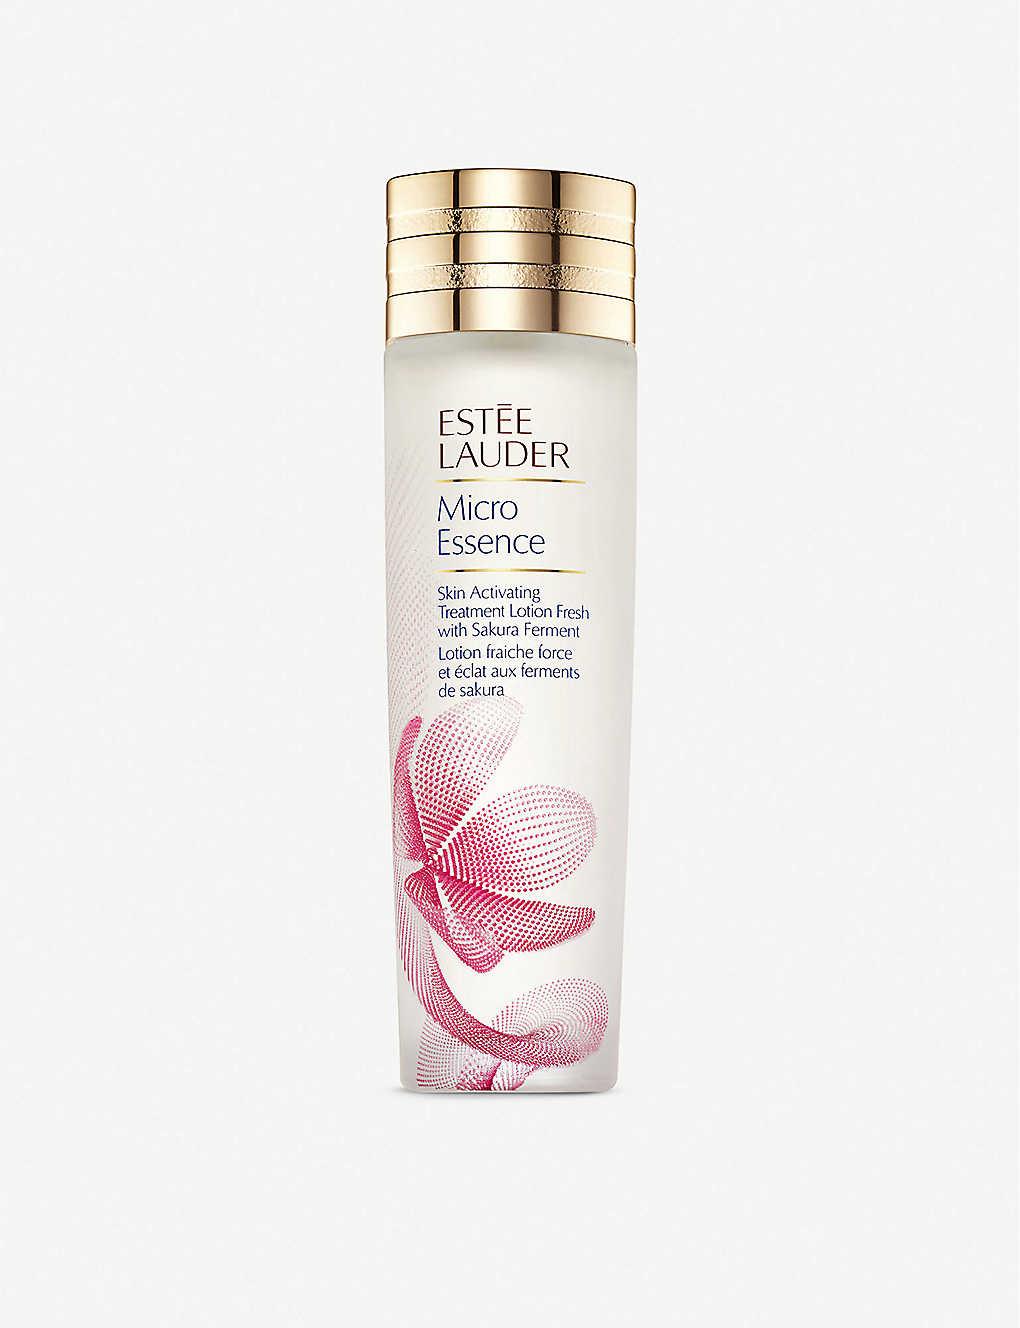 ESTEE LAUDER: Micro Essence Skin Activating Treatment Lotion with Sakura Ferment 200ml